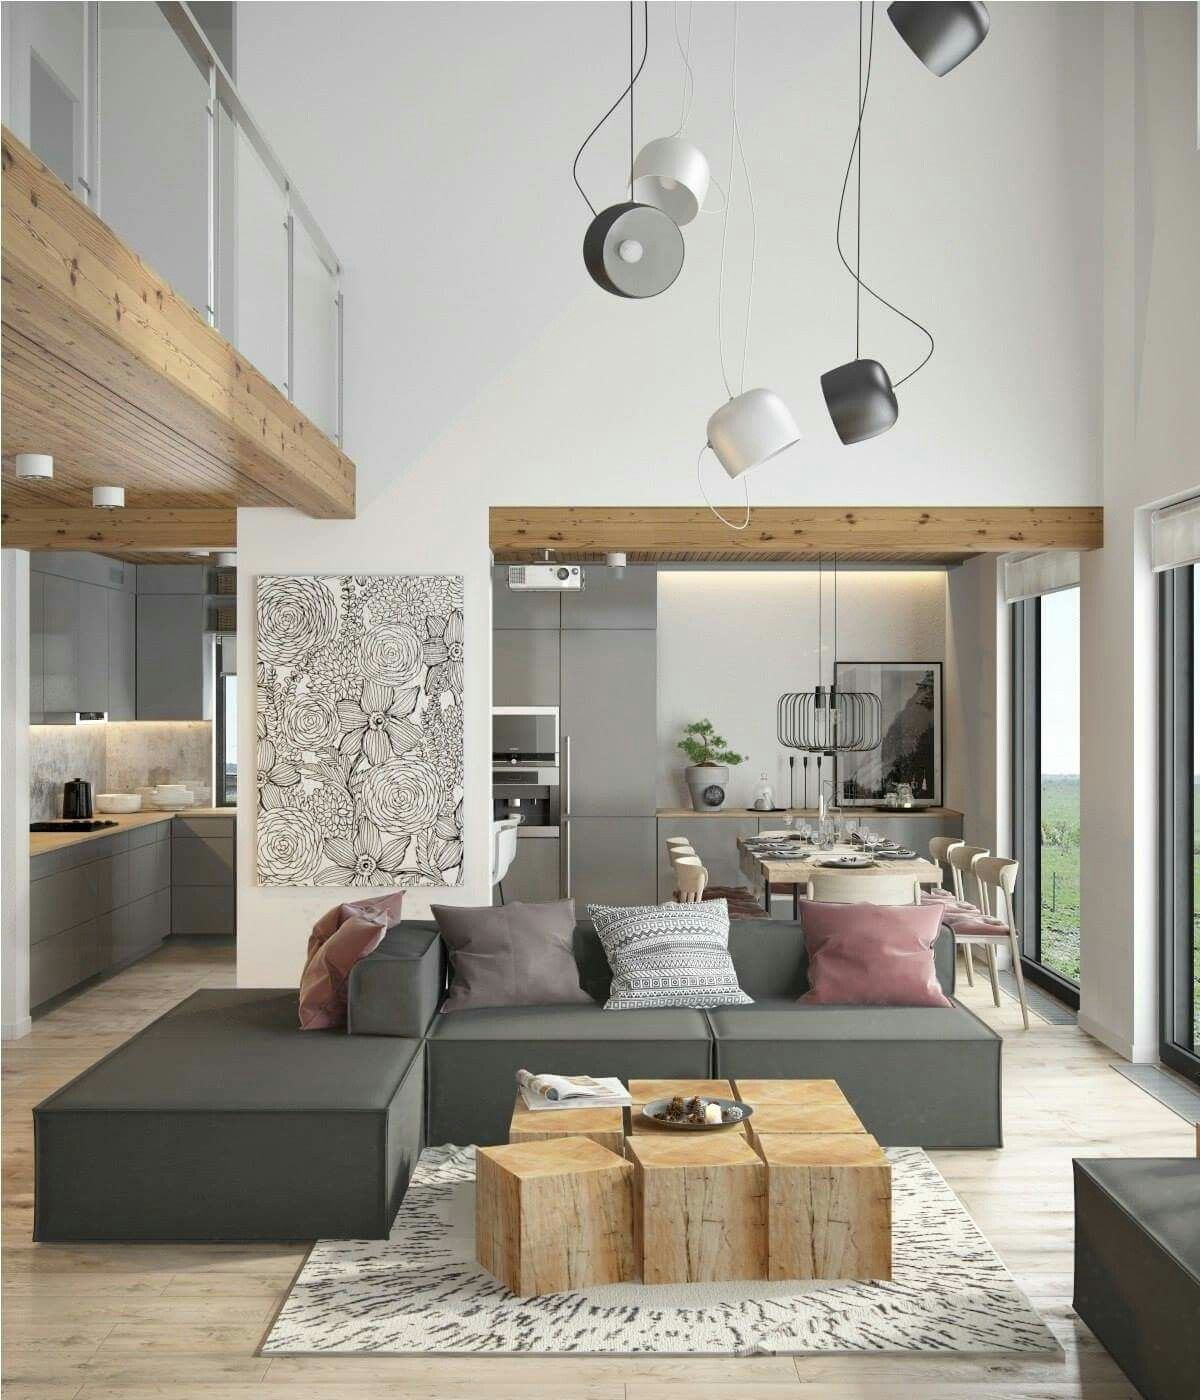 Hermosa sala | Casa en surubi\'í | Pinterest | Interiors, Living ...